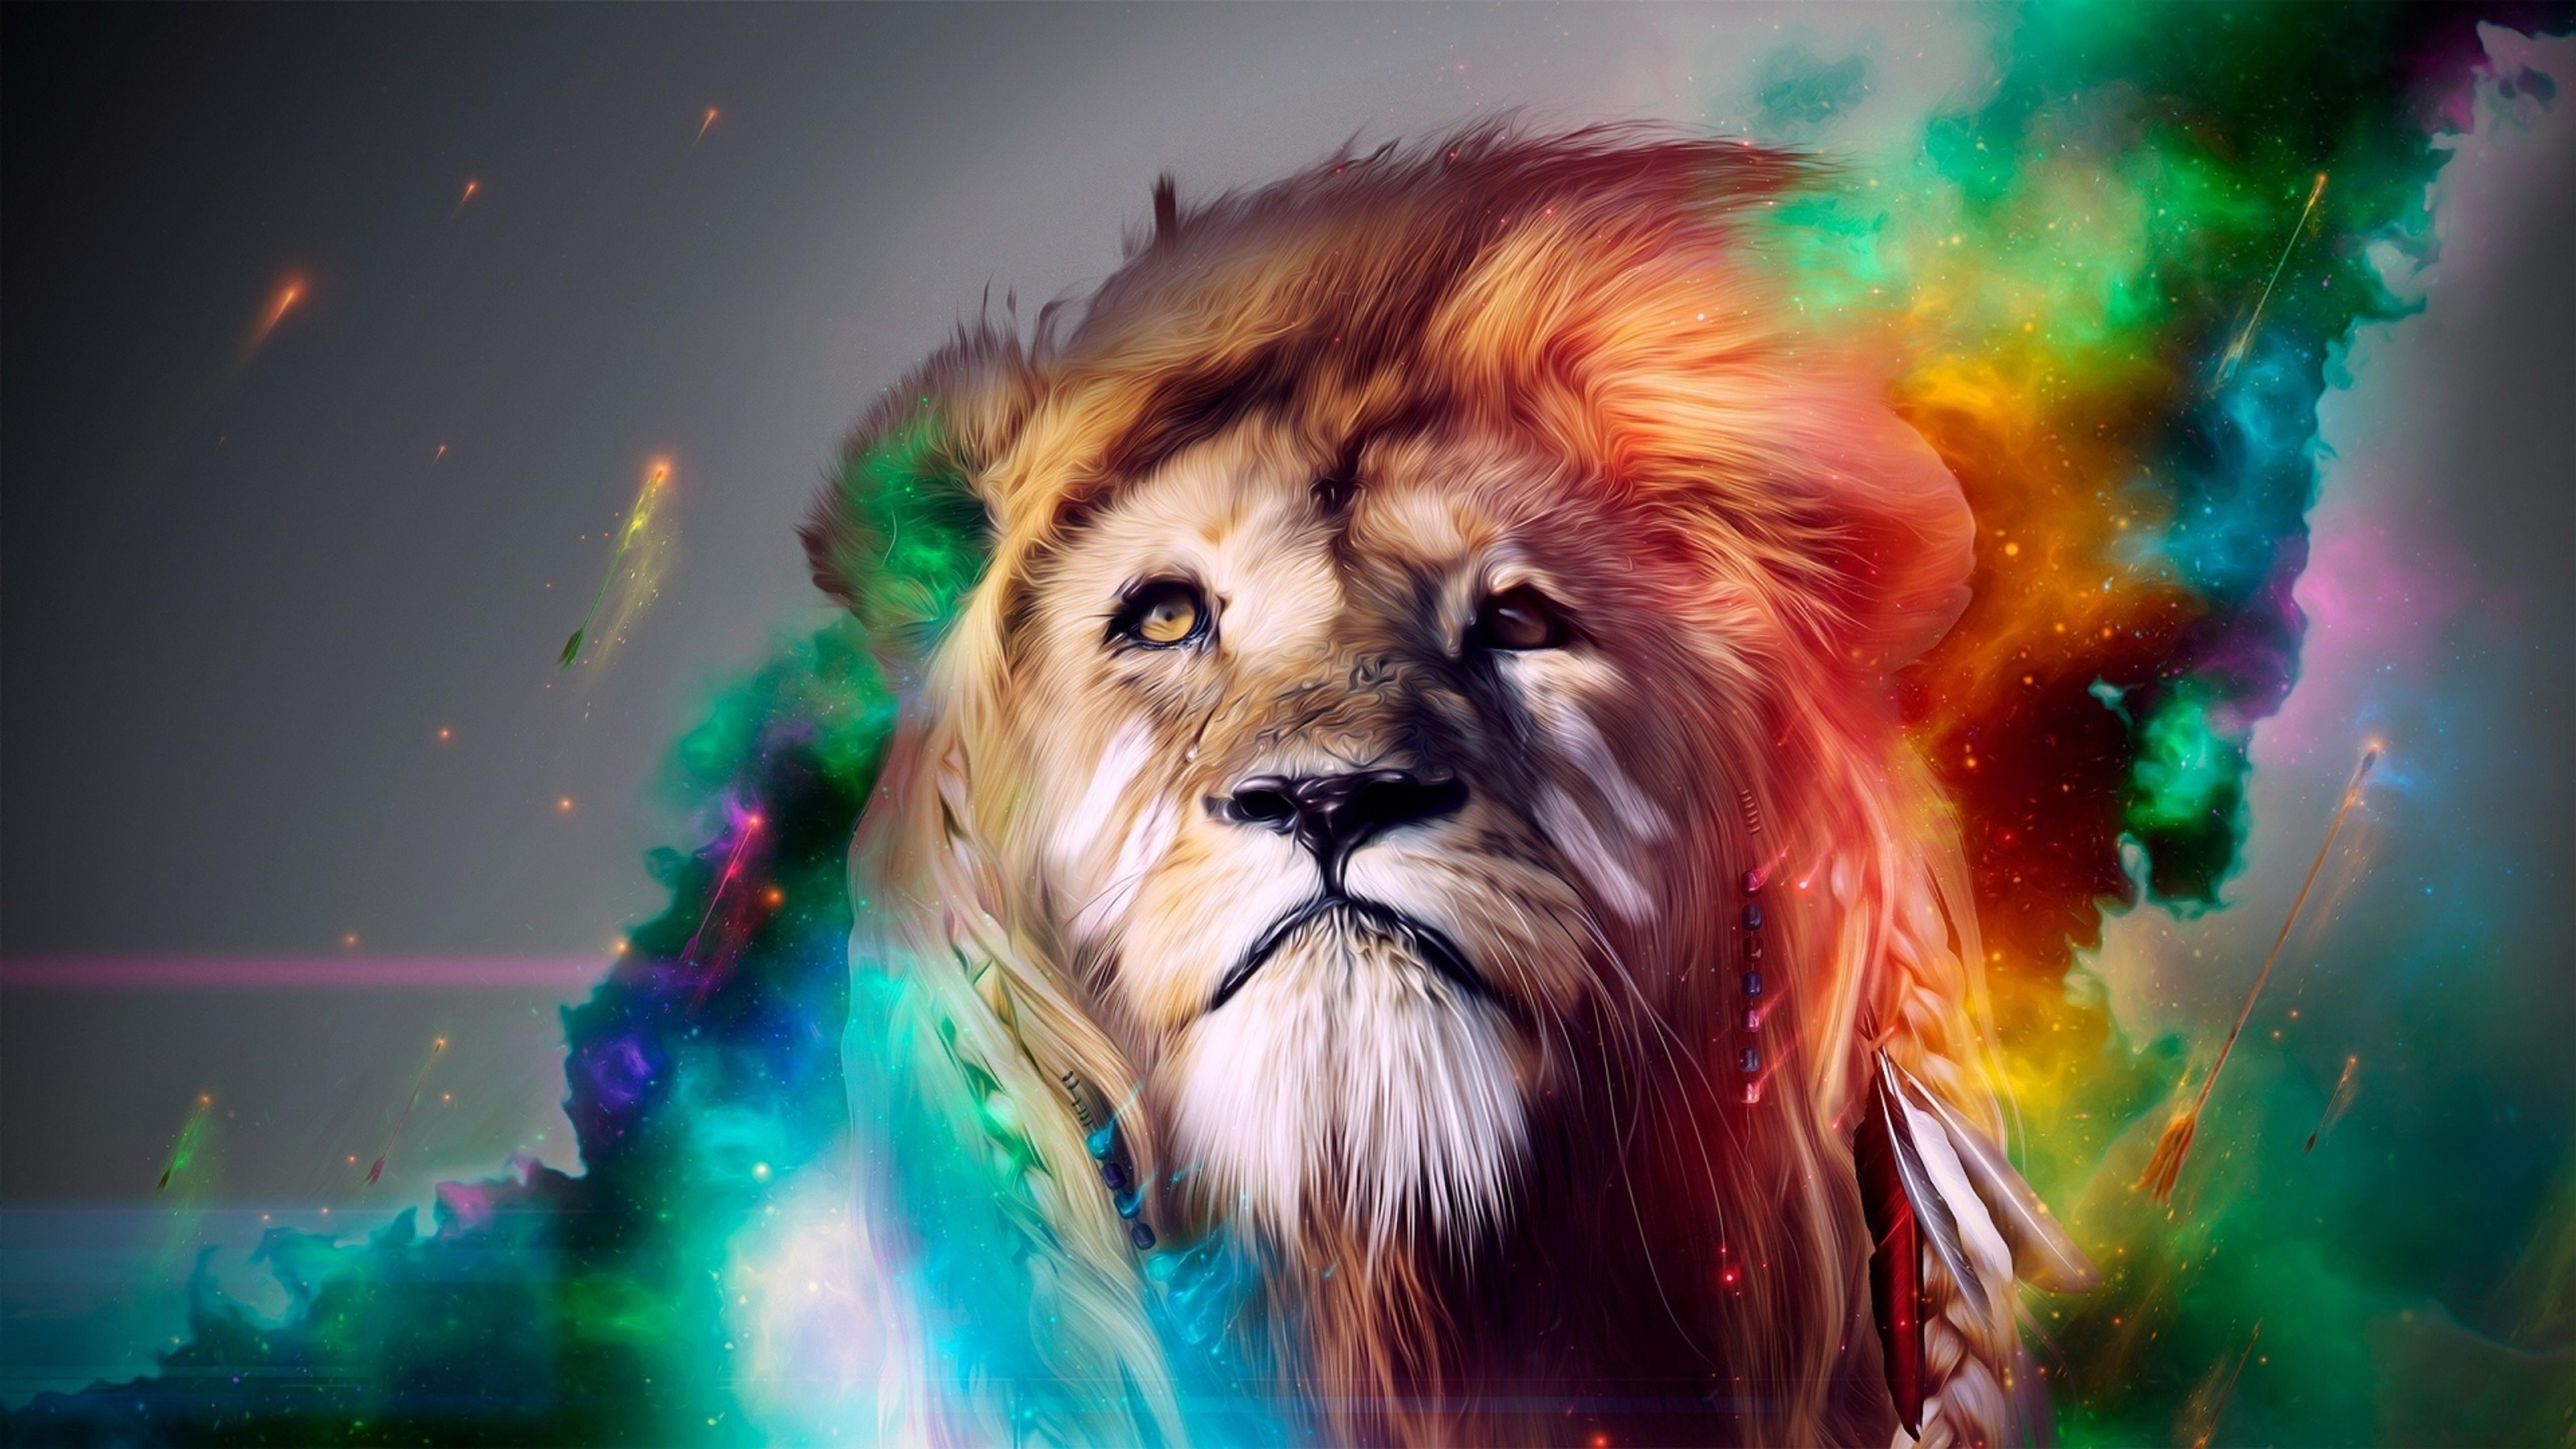 Abstract Rainbow Lion